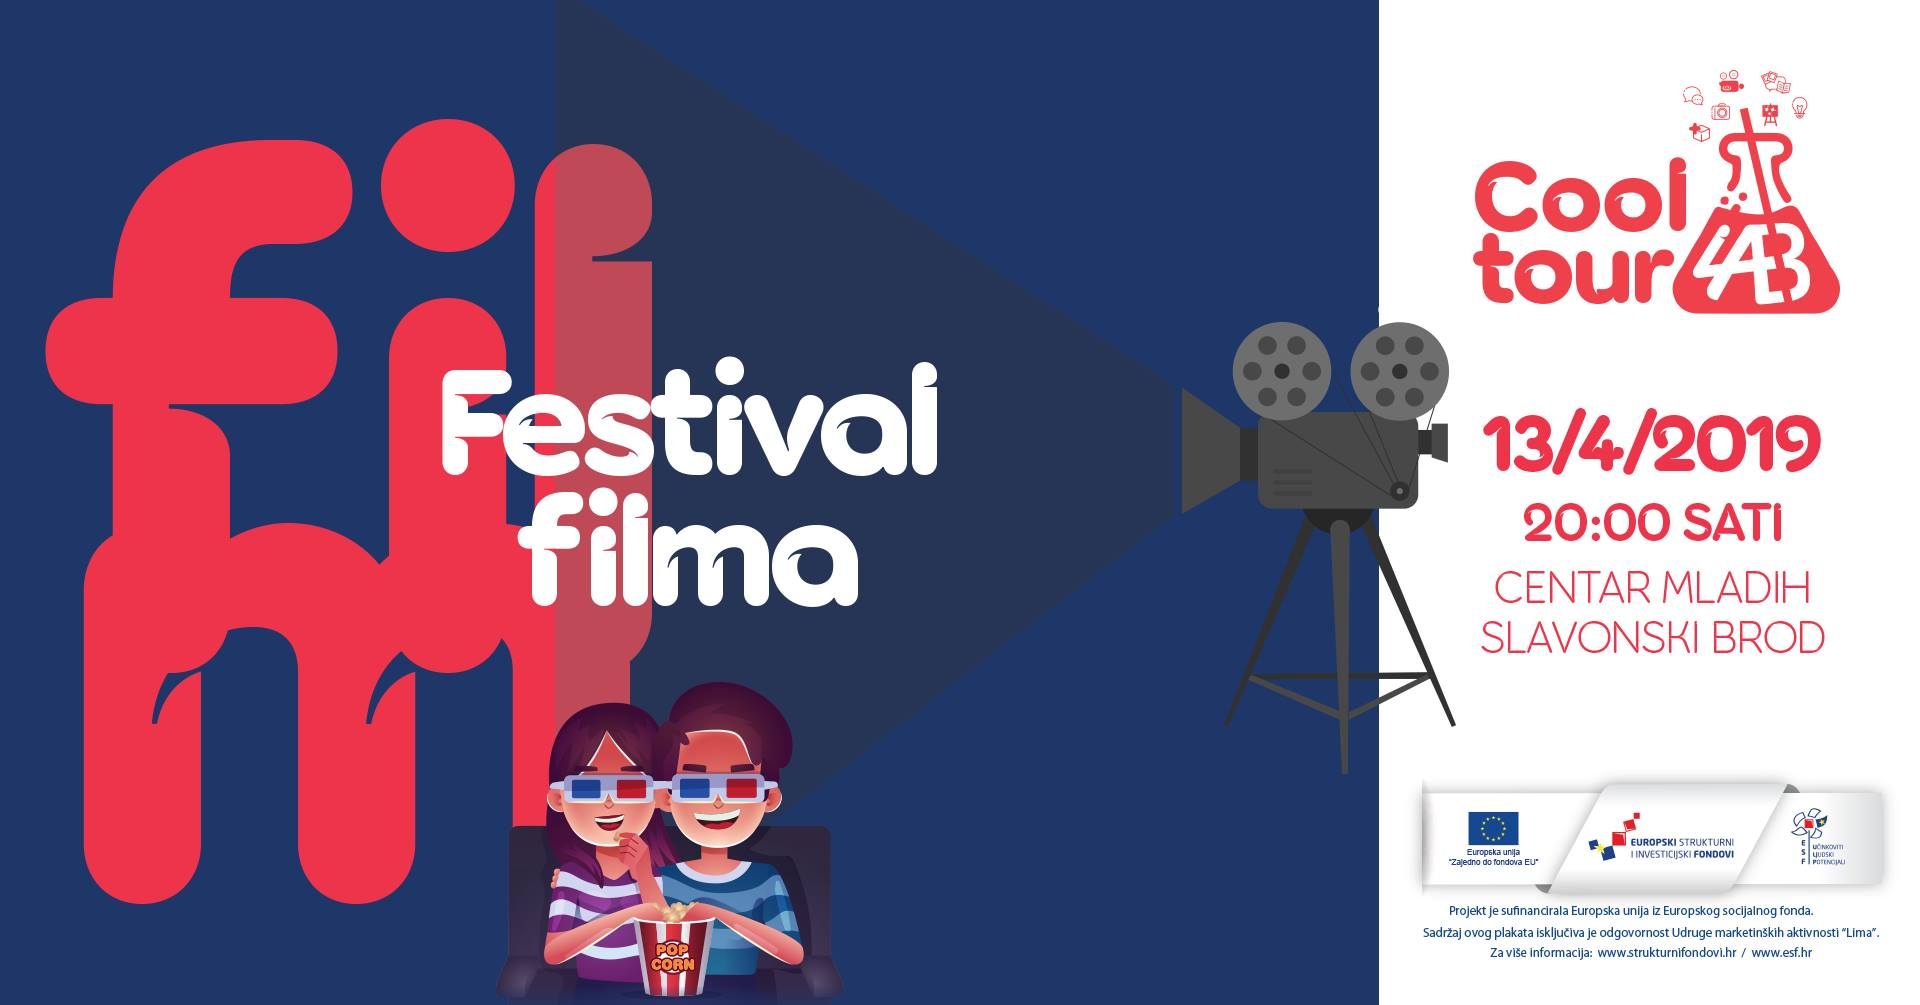 Festival Filma CoolTour Lab